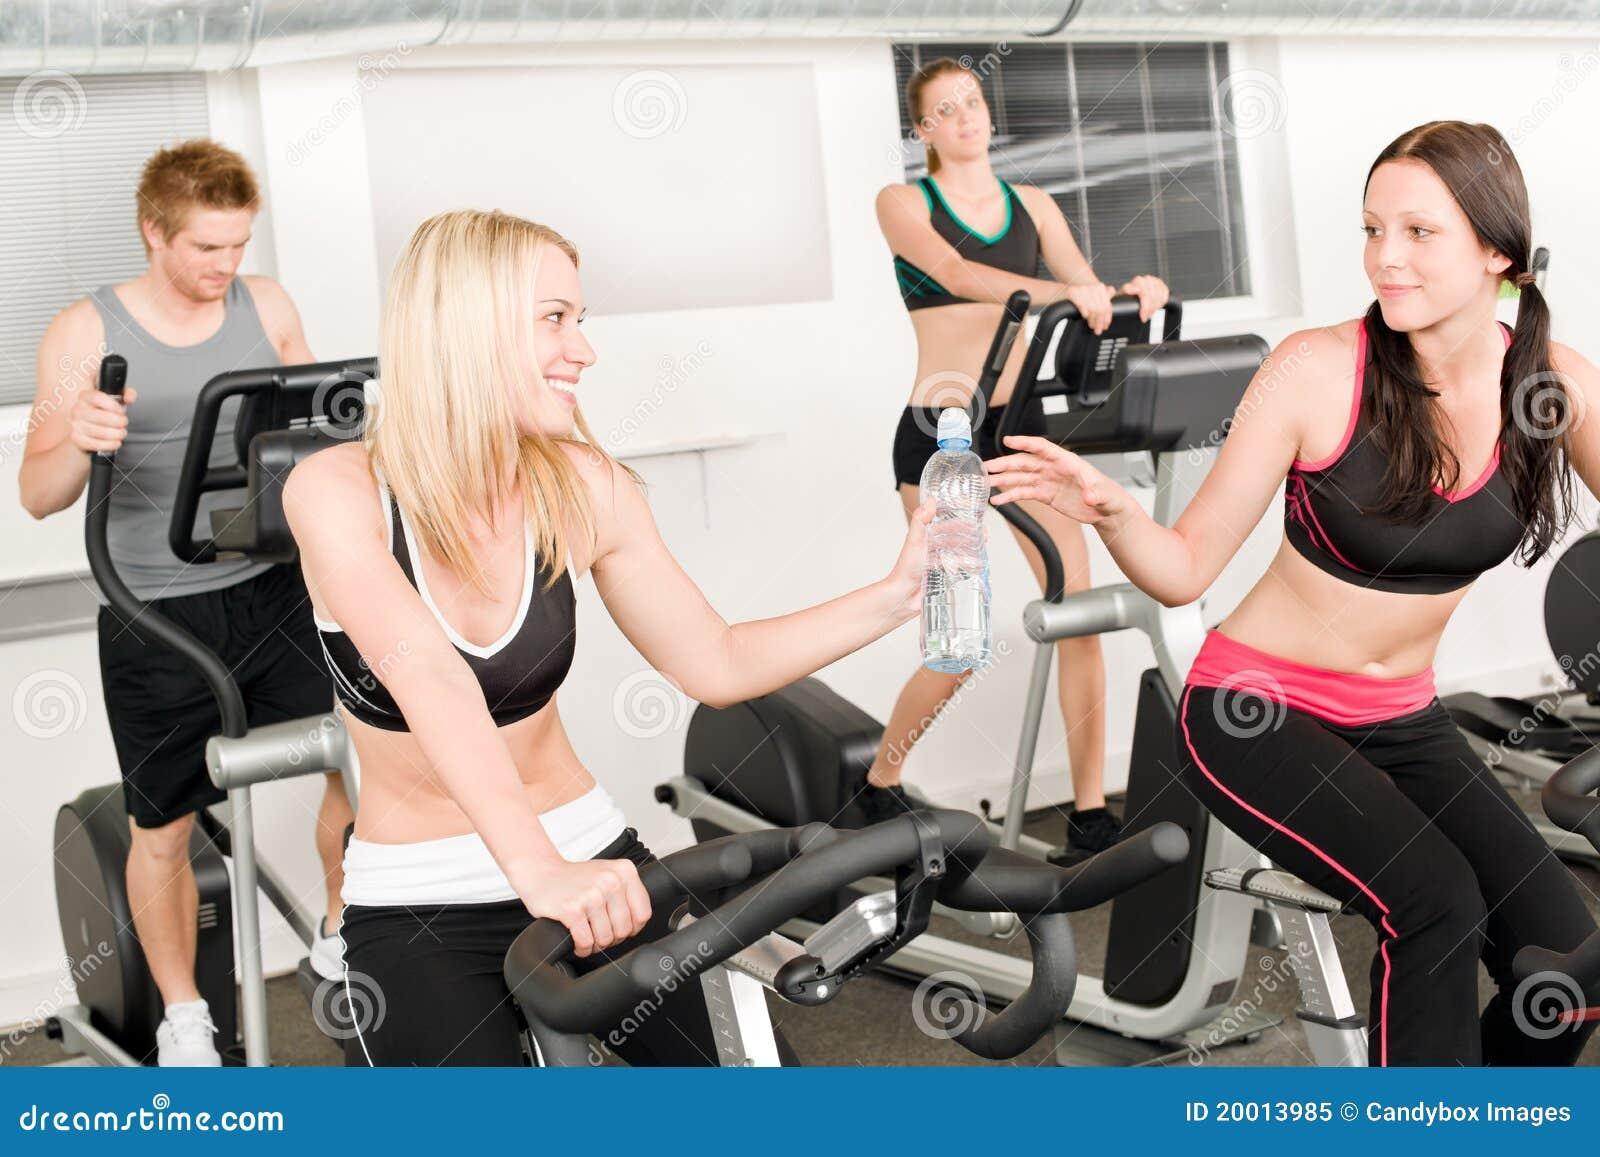 fitnes-trener-lesbiyanka